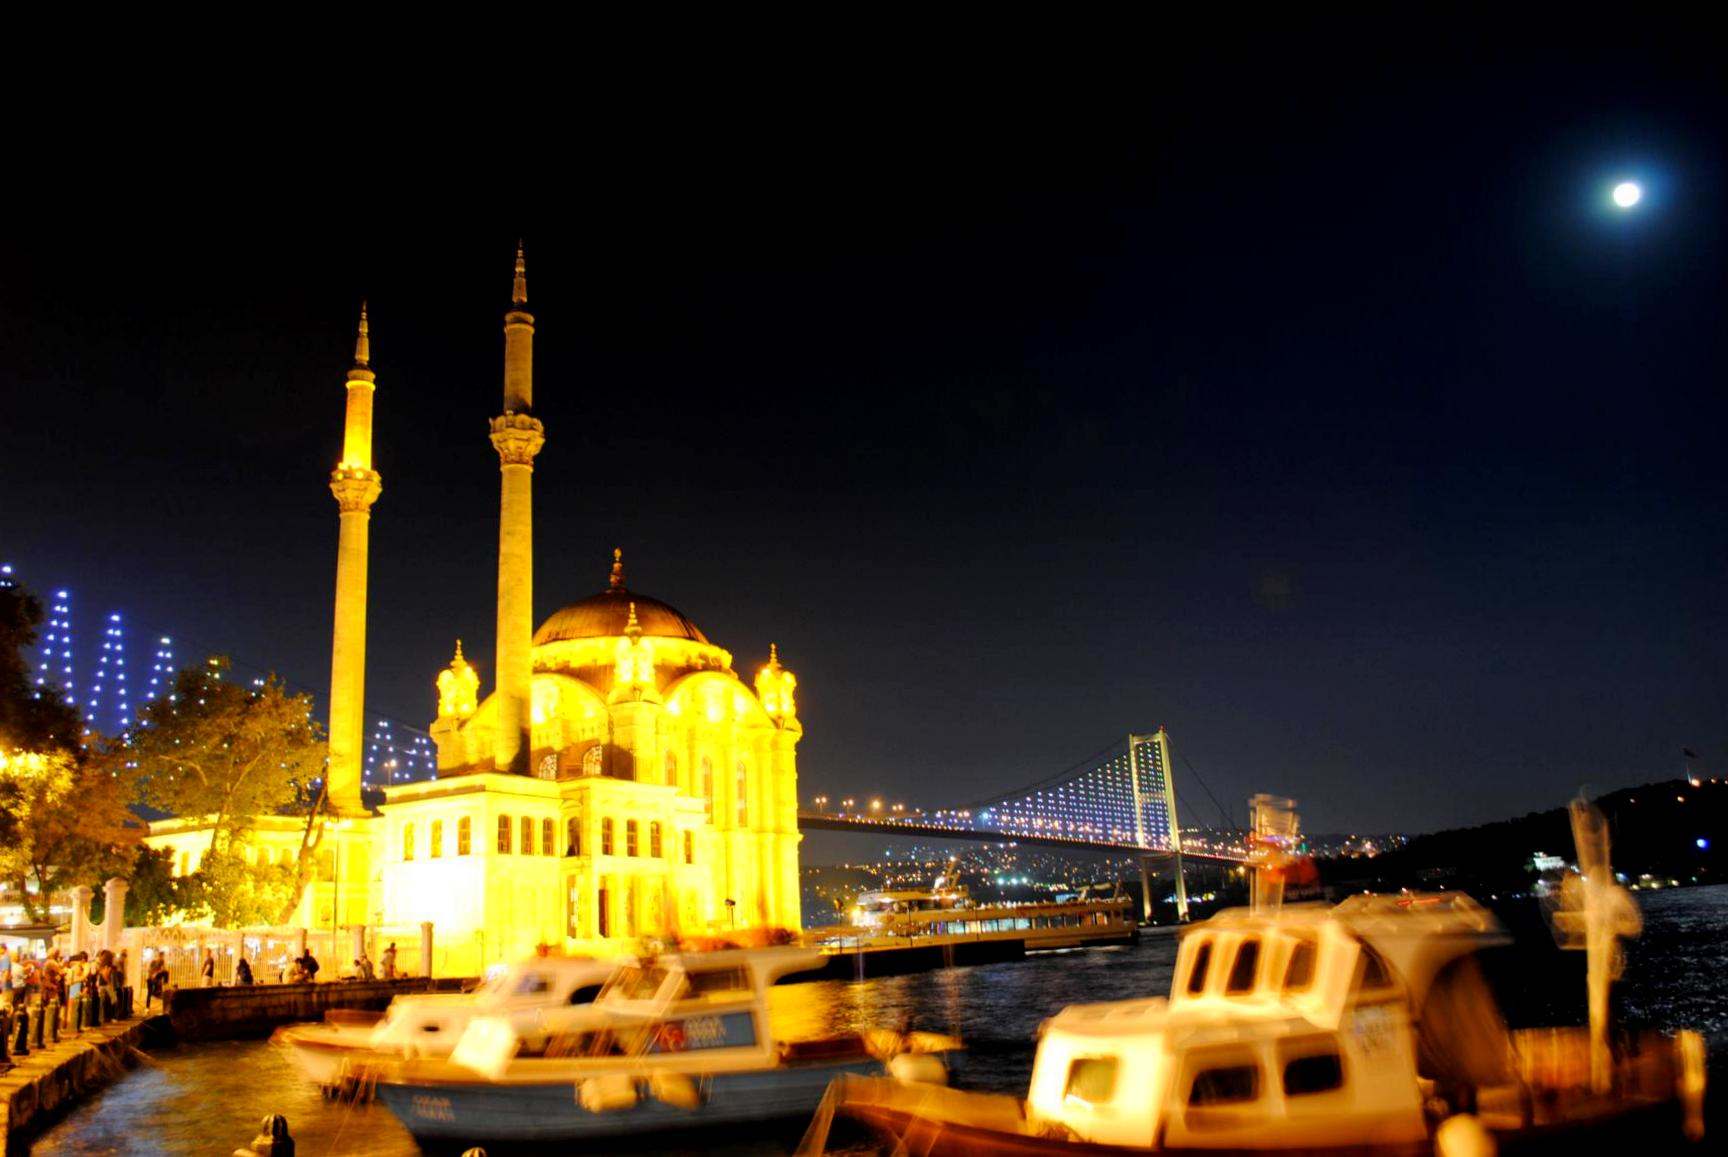 mezquita-ortakoy-1